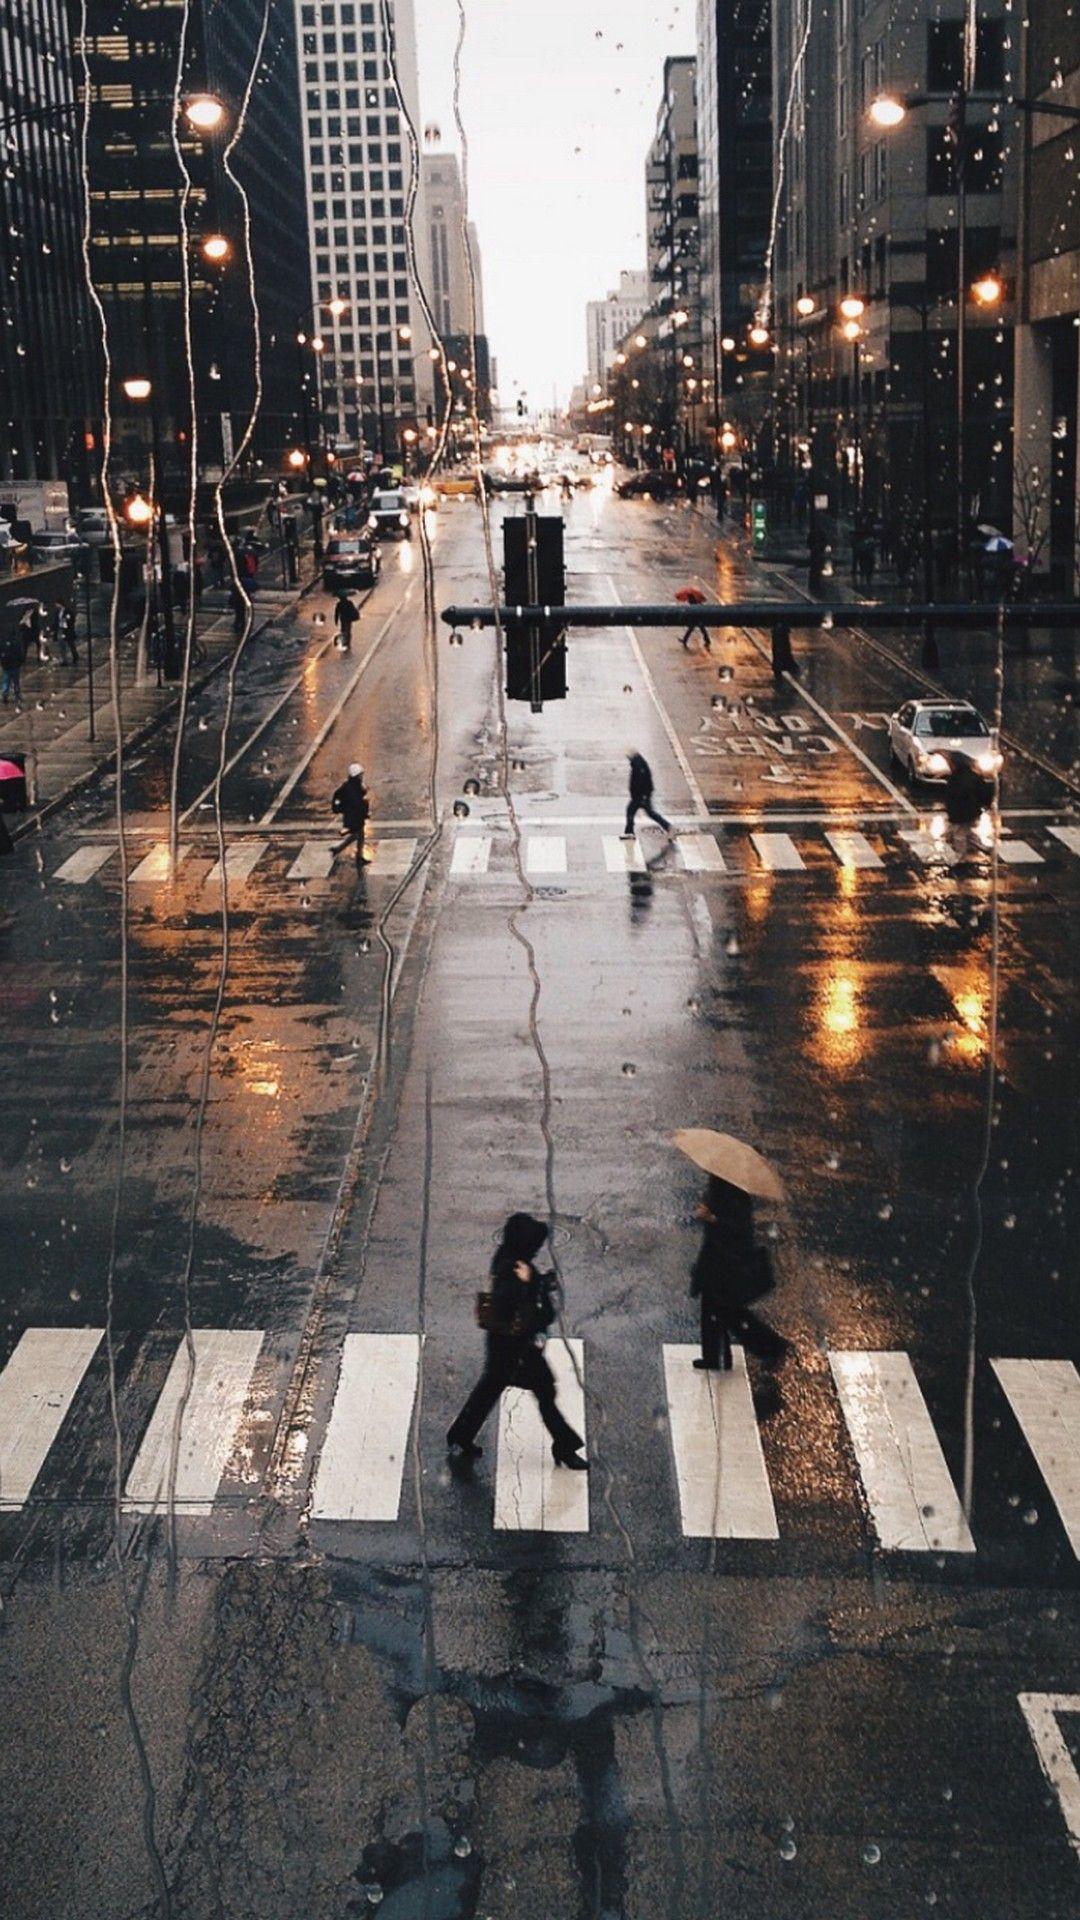 Rainy City iPhone 6 Wallpaper   iPhoneWallpapers   Iphone wallpaper, Photography, Rainy city